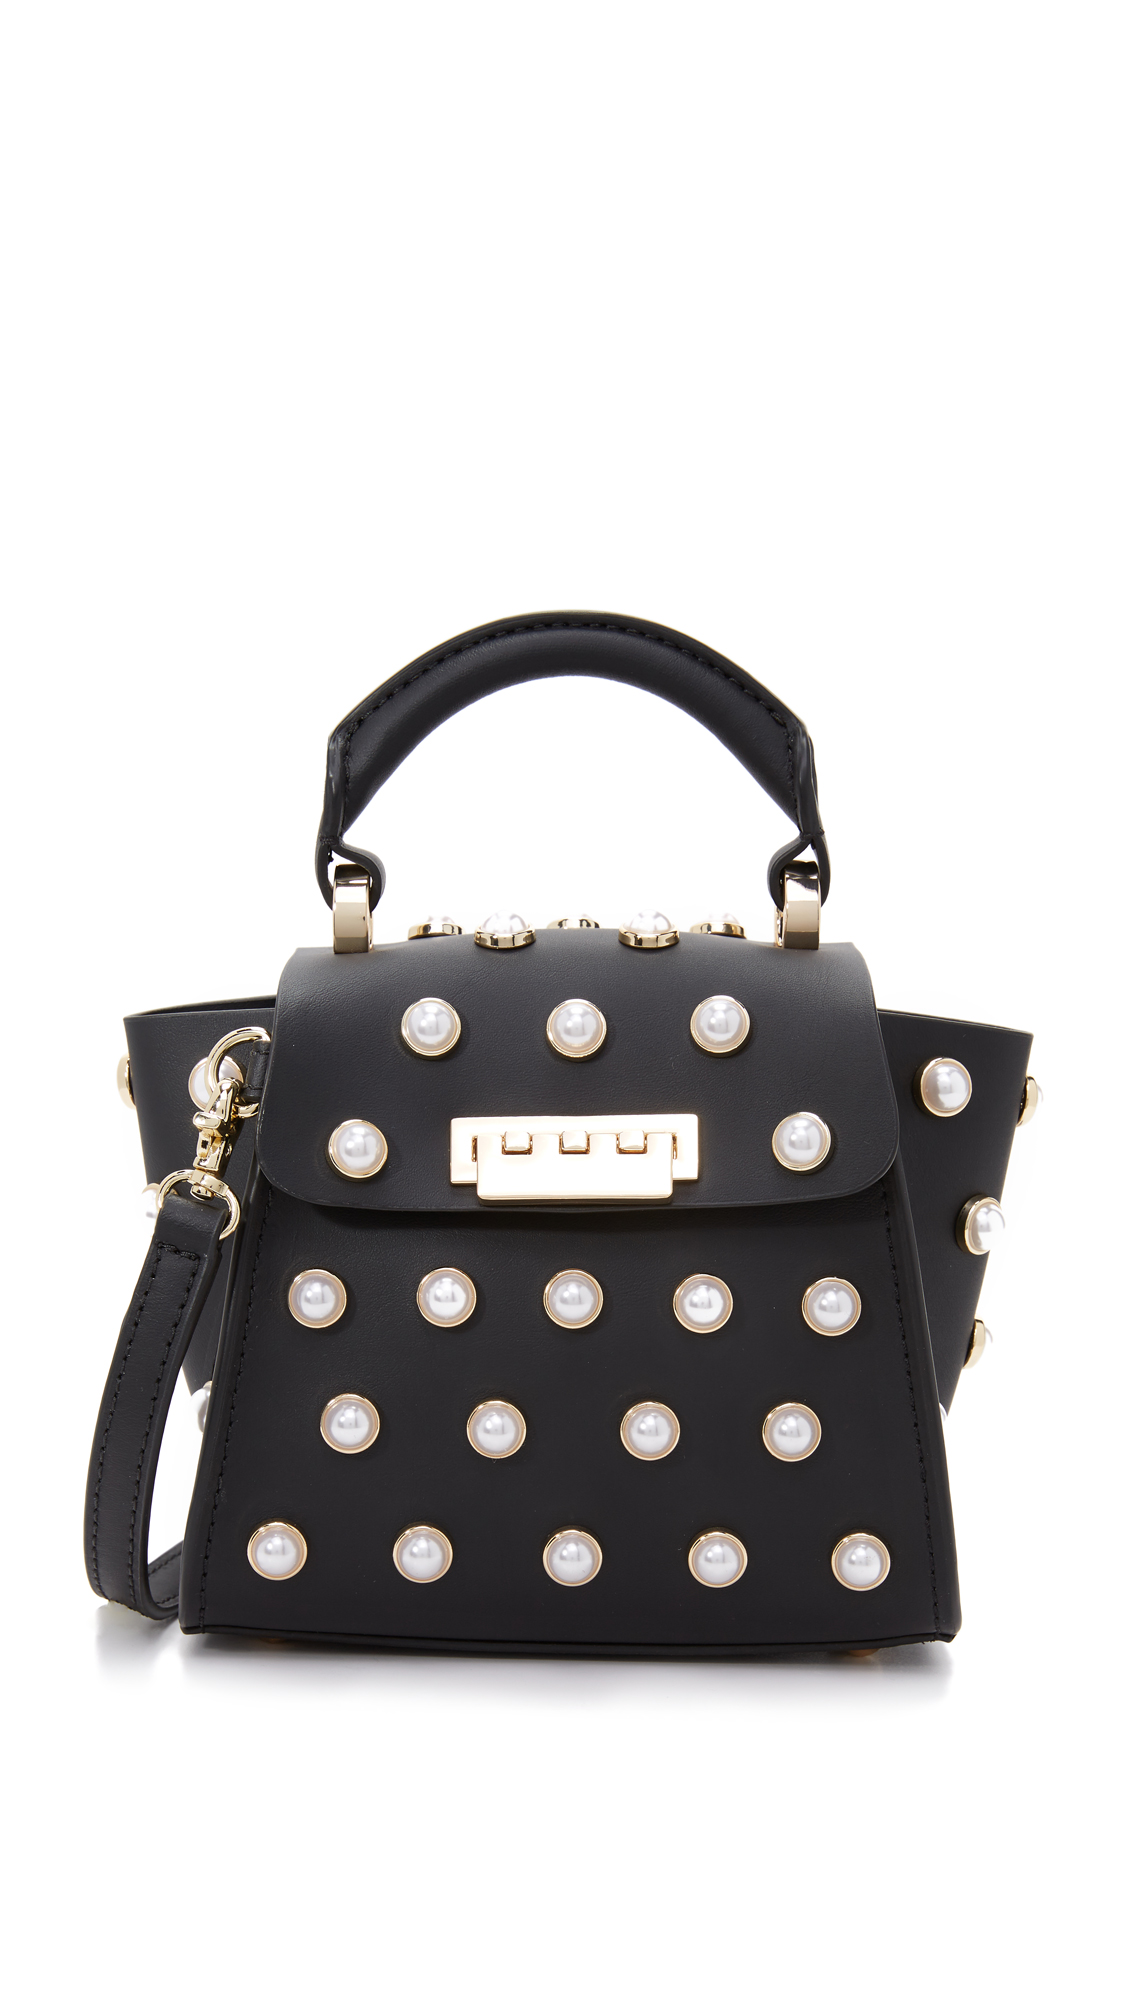 ZAC Zac Posen Eartha Imitation Pearl Top Handle Mini Cross Body Bag - Black